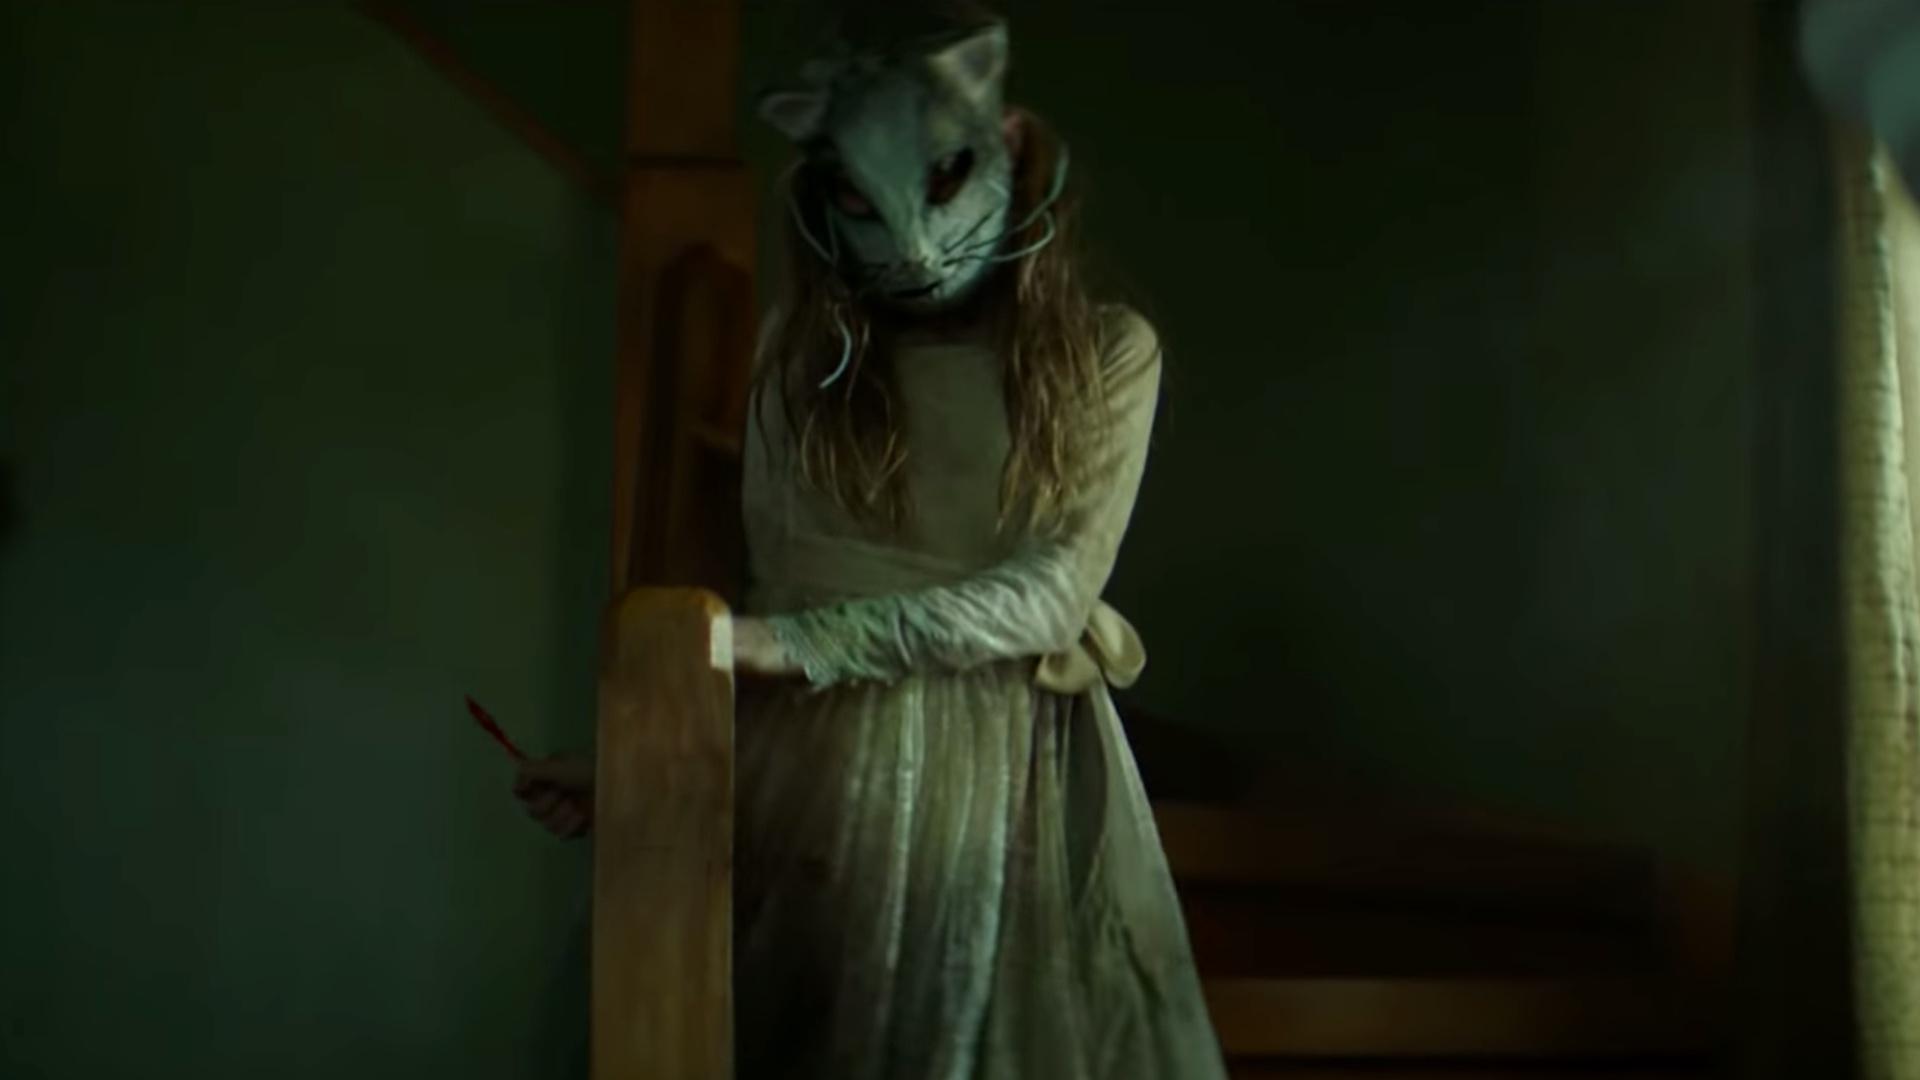 the-final-trailer-for-stephen-kings-pet-sematary-is-pretty-unsettling-social.jpg